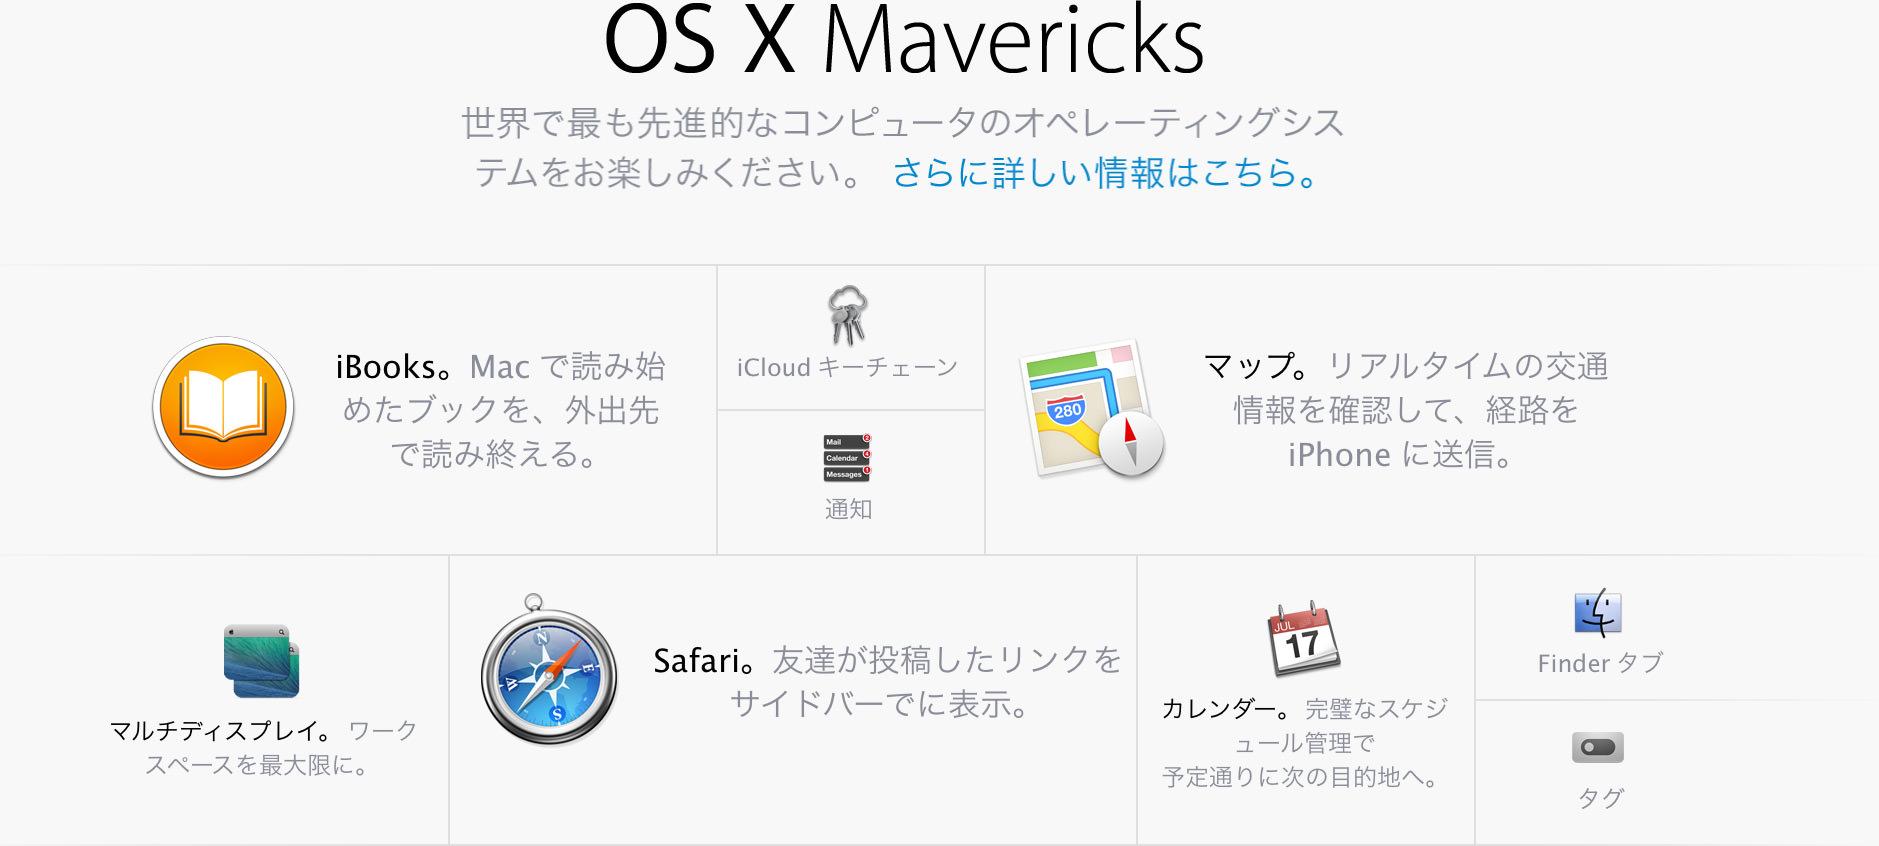 Mavericks-new-feature.jpg